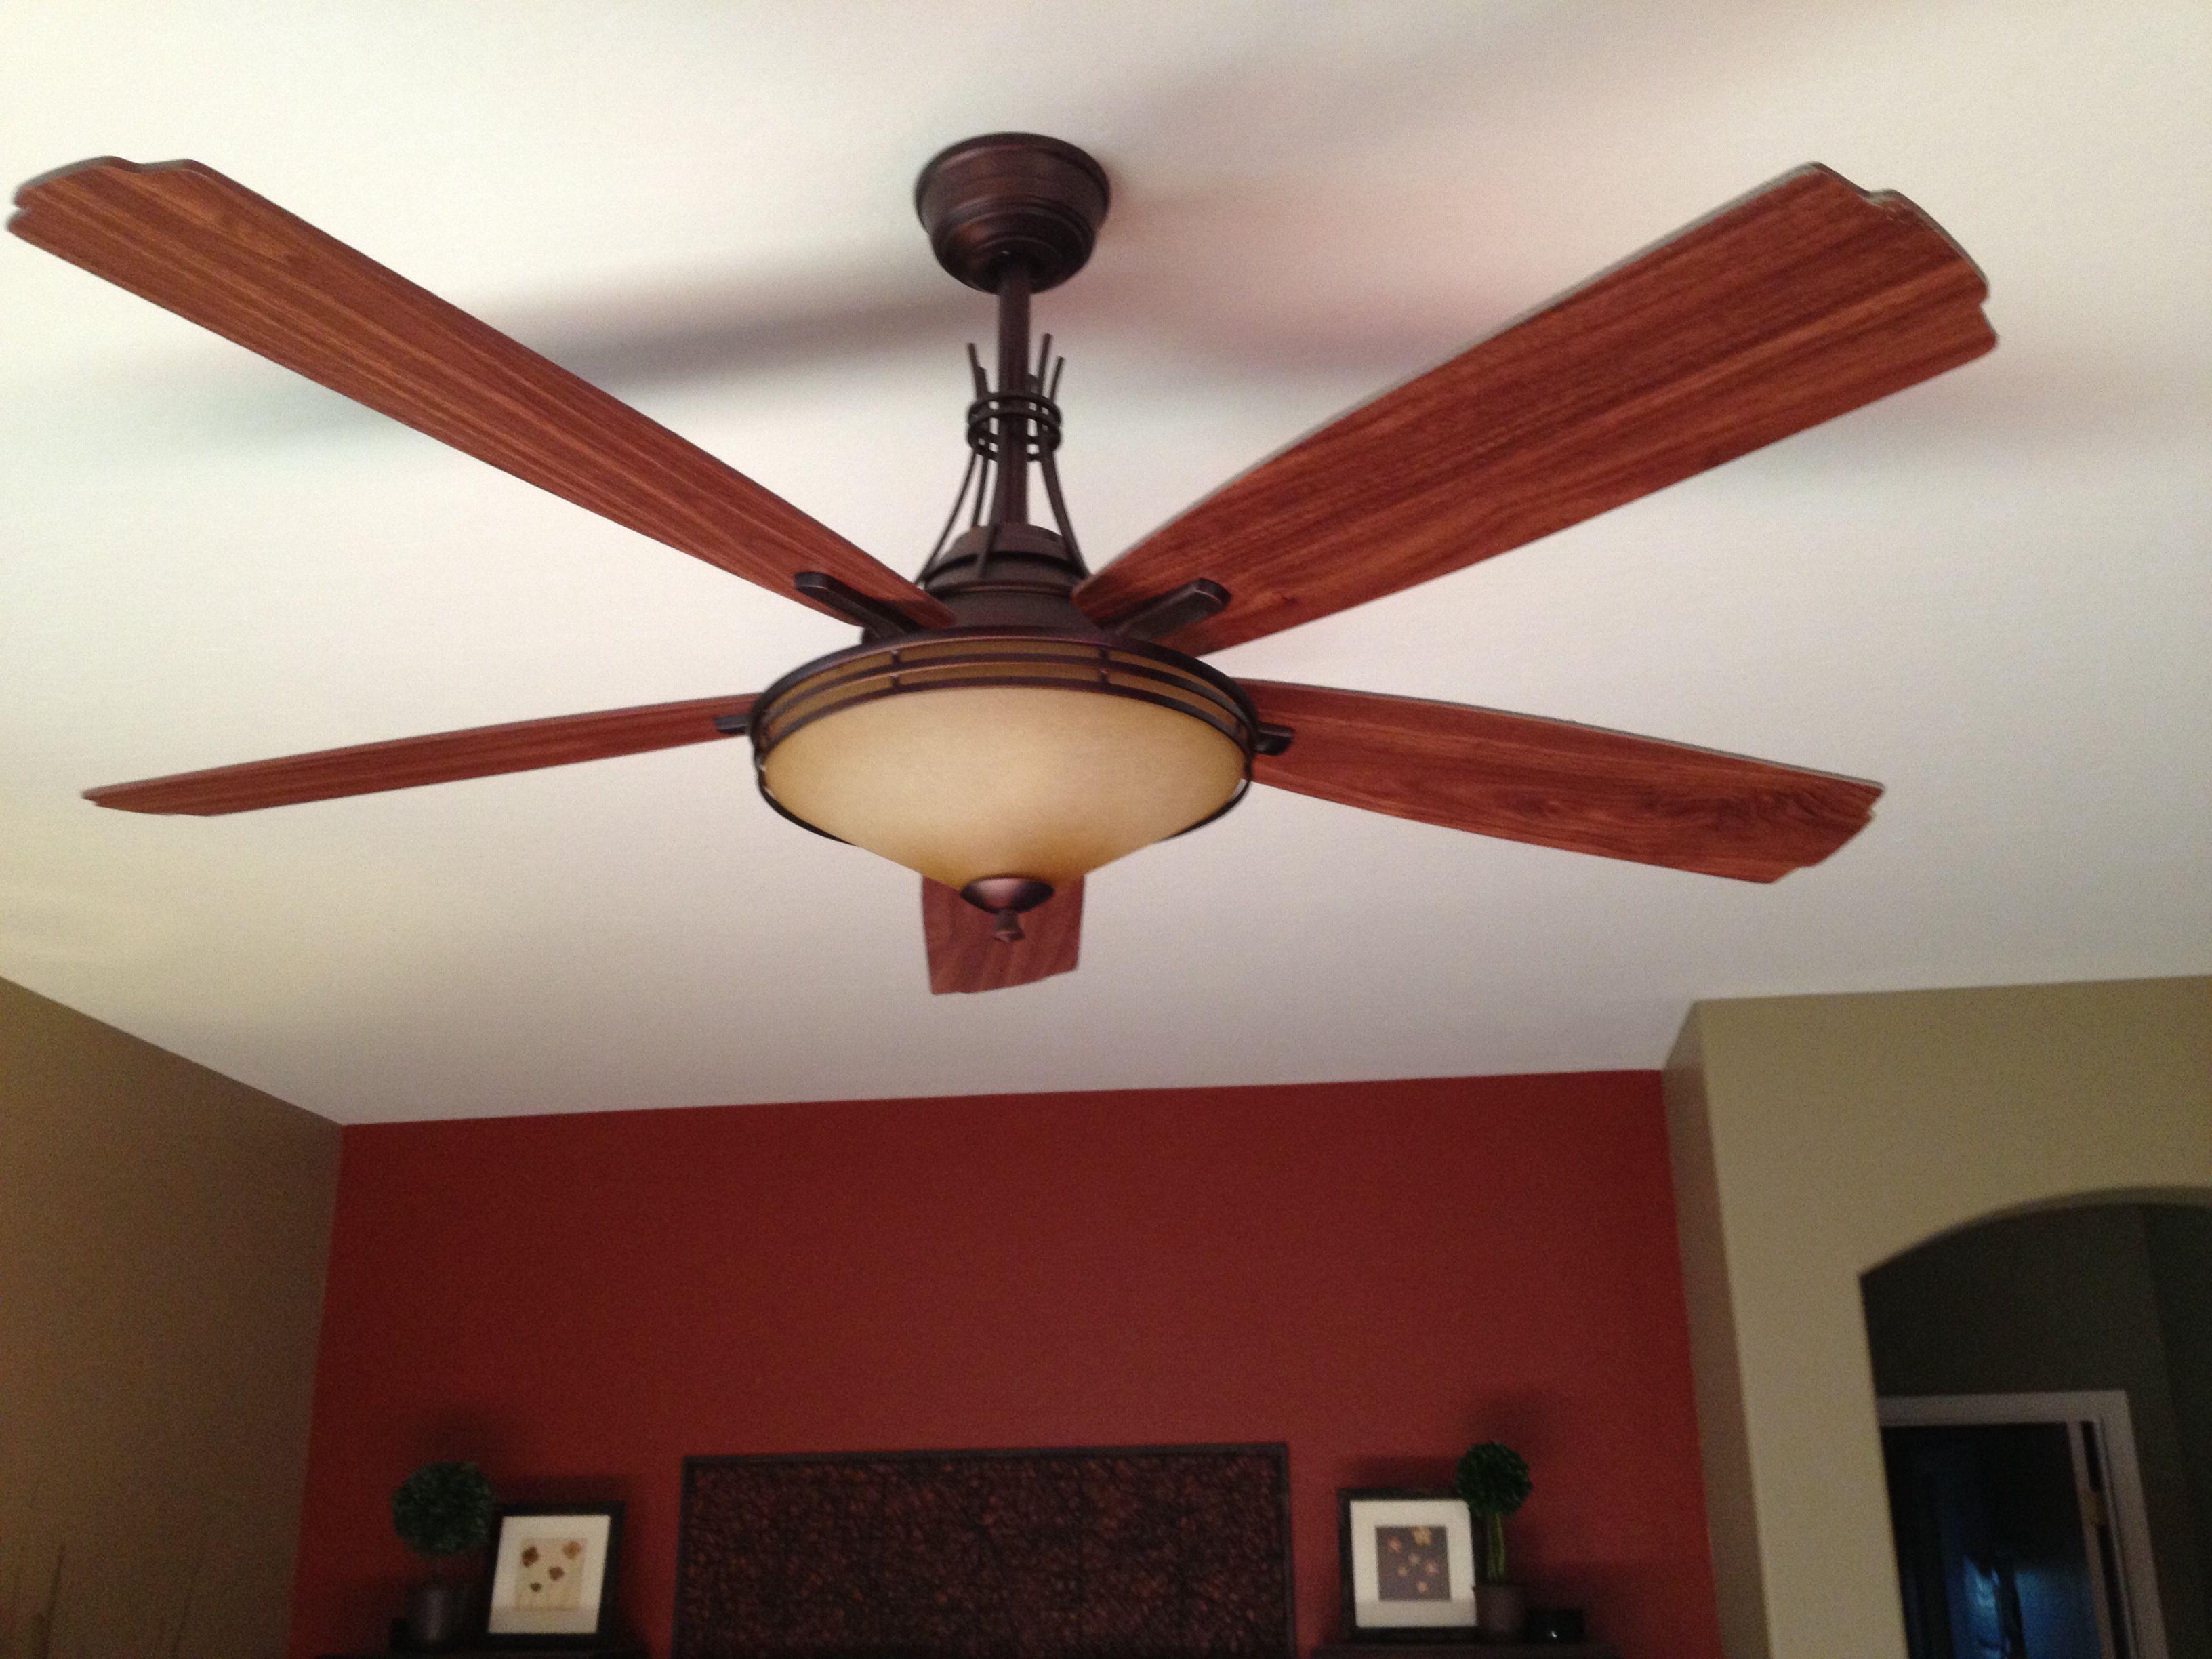 Mission style ceiling fan in great room my home decor pinterest mission style ceiling fan in great room aloadofball Gallery